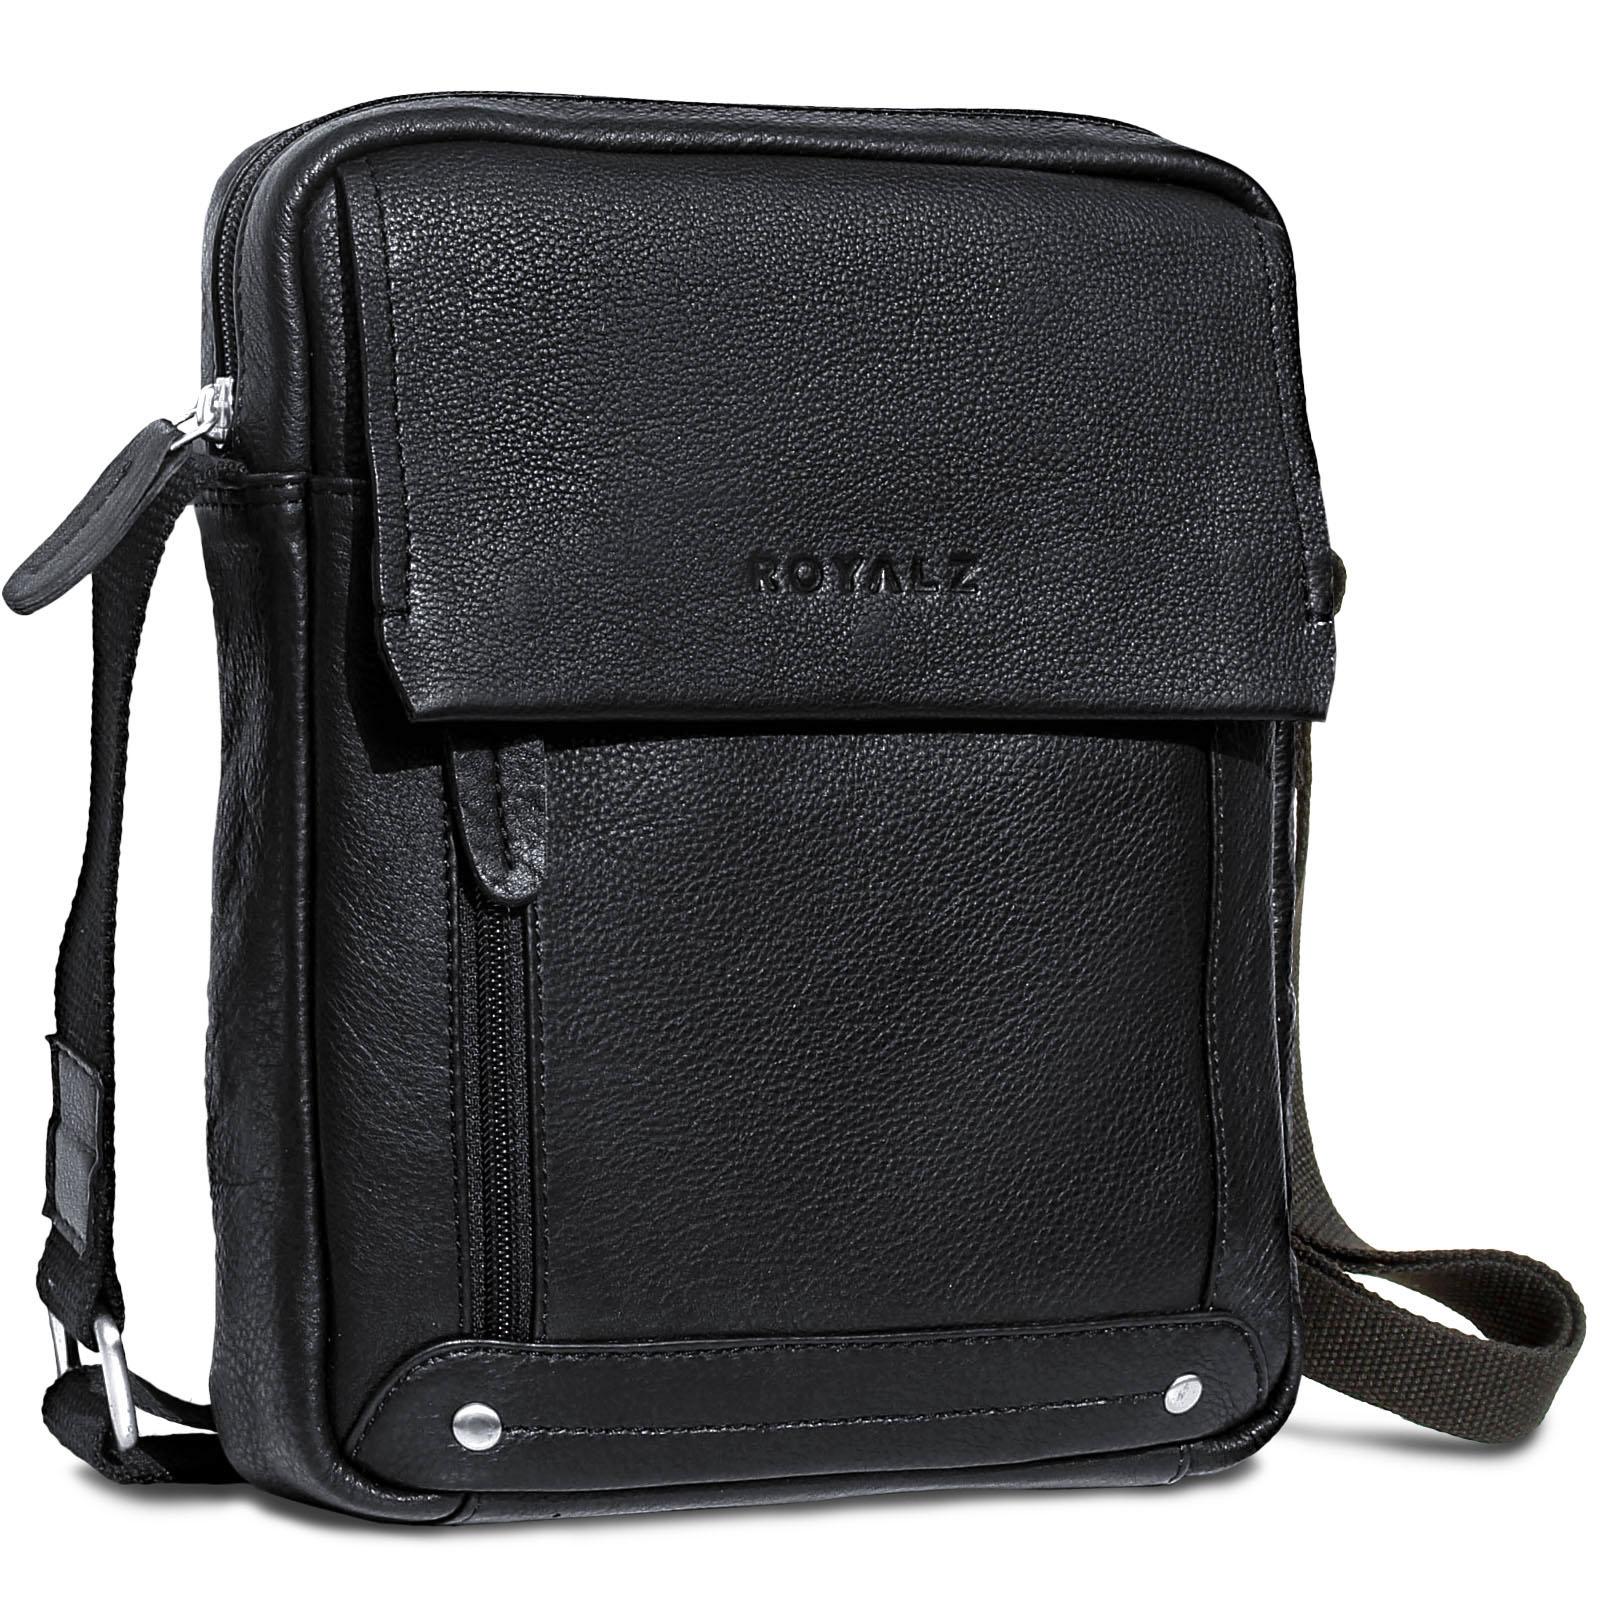 4f7d4f4a62632 ROYALZ Leder Umhängetasche für Herren klein kompakte Design Ledertasche  Messenger Bag Vintage-Look